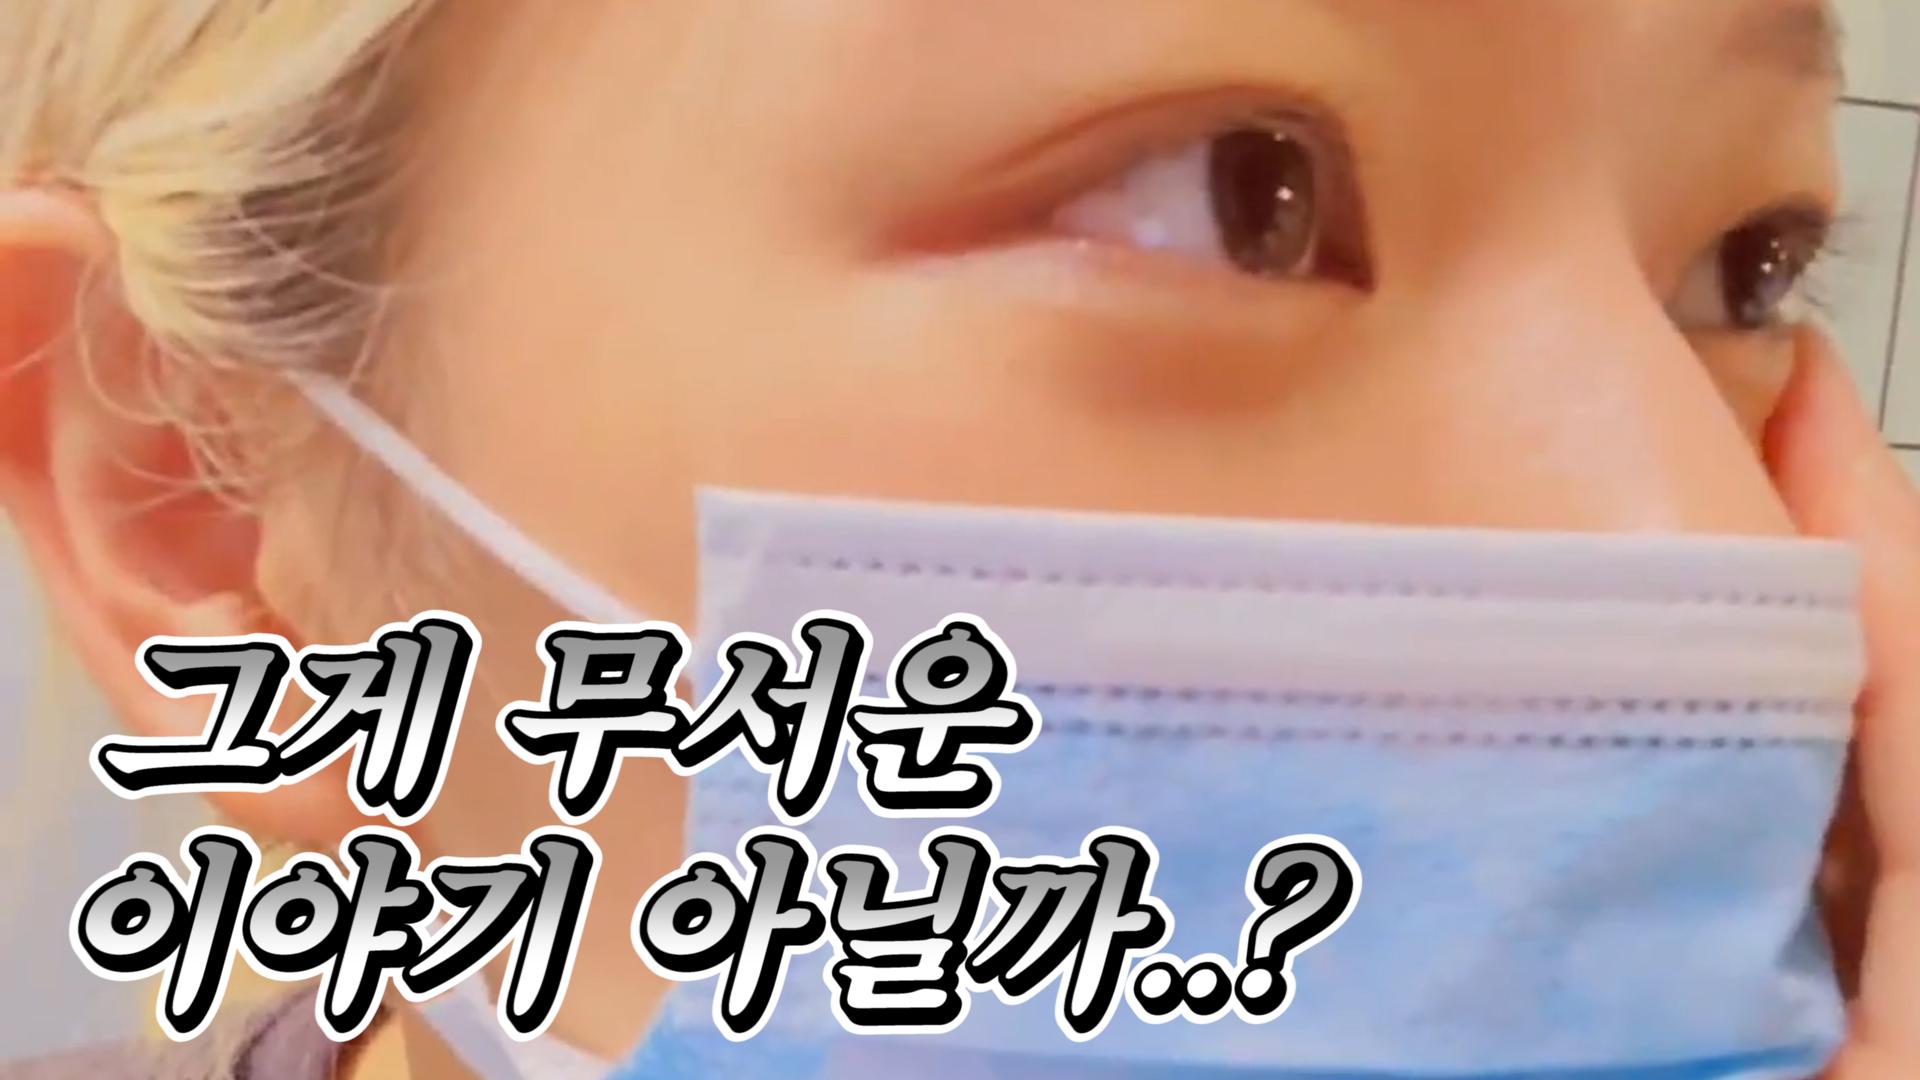 [TWICE] 전세계인들이 거짓말 못하는 한가지.. 유정연 잘생겼다💖✨ (JEONGYEON talking about favorite drama and movie)